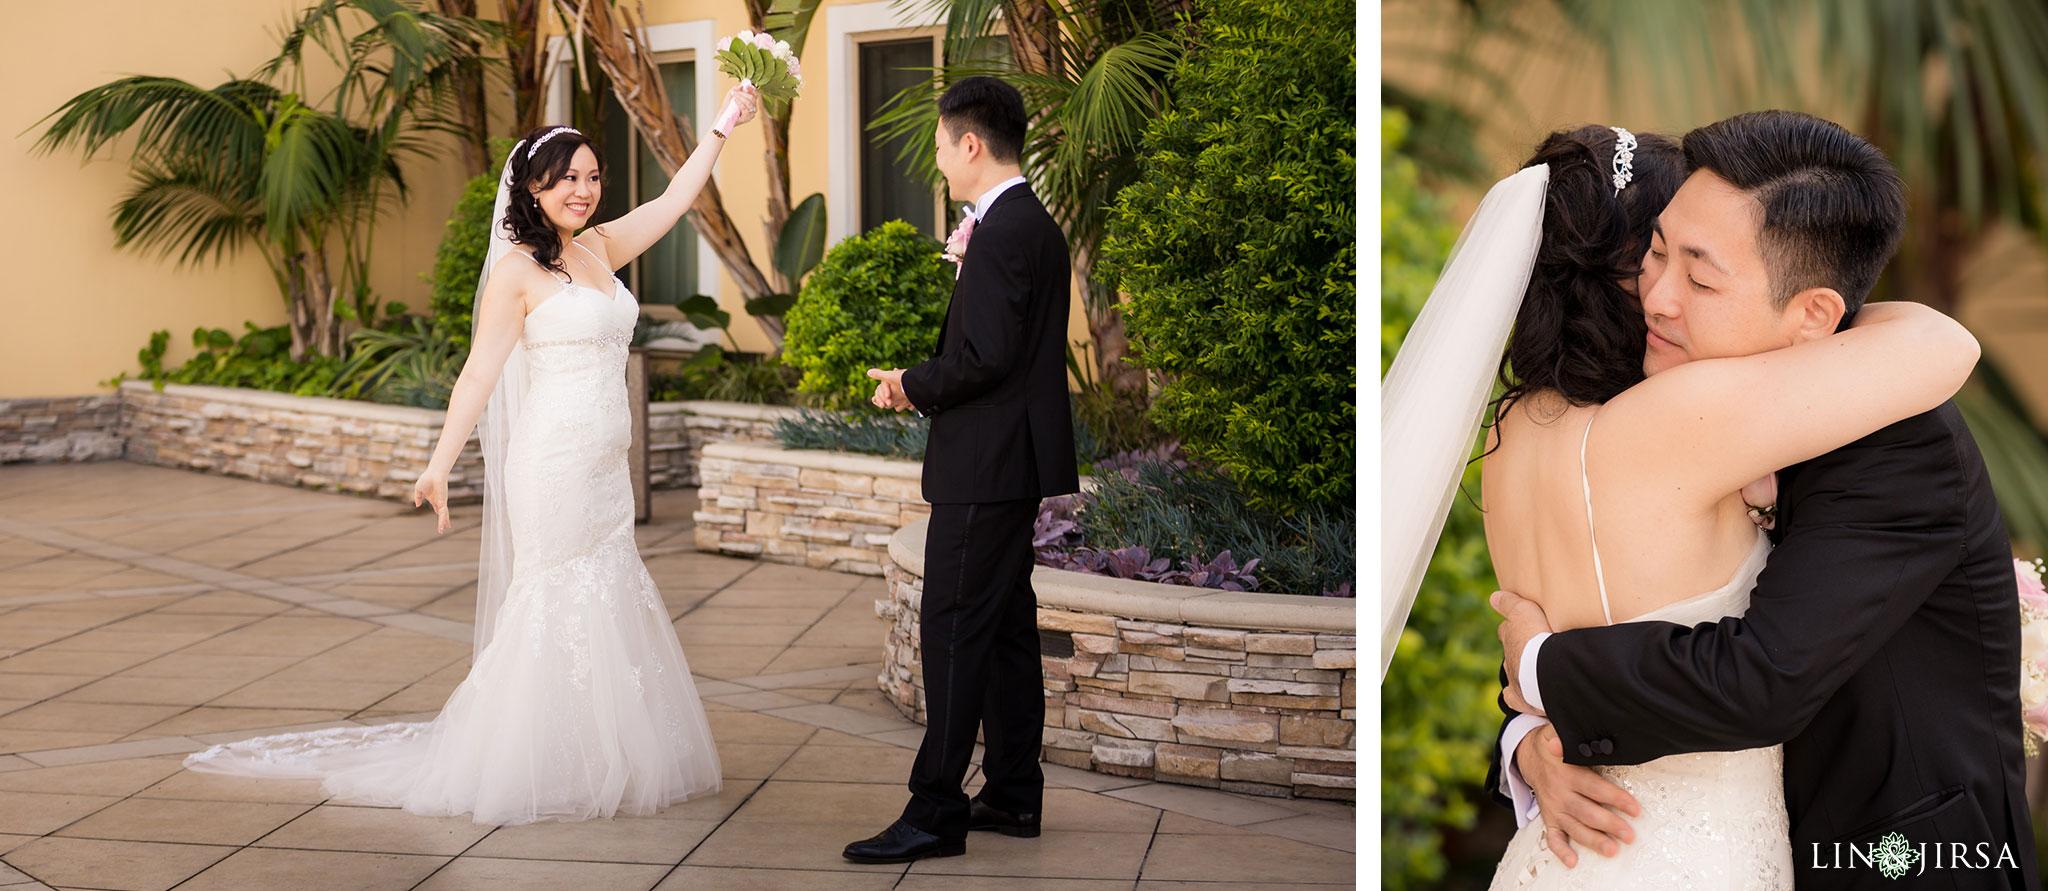 12 san gabriel hilton wedding first look photography